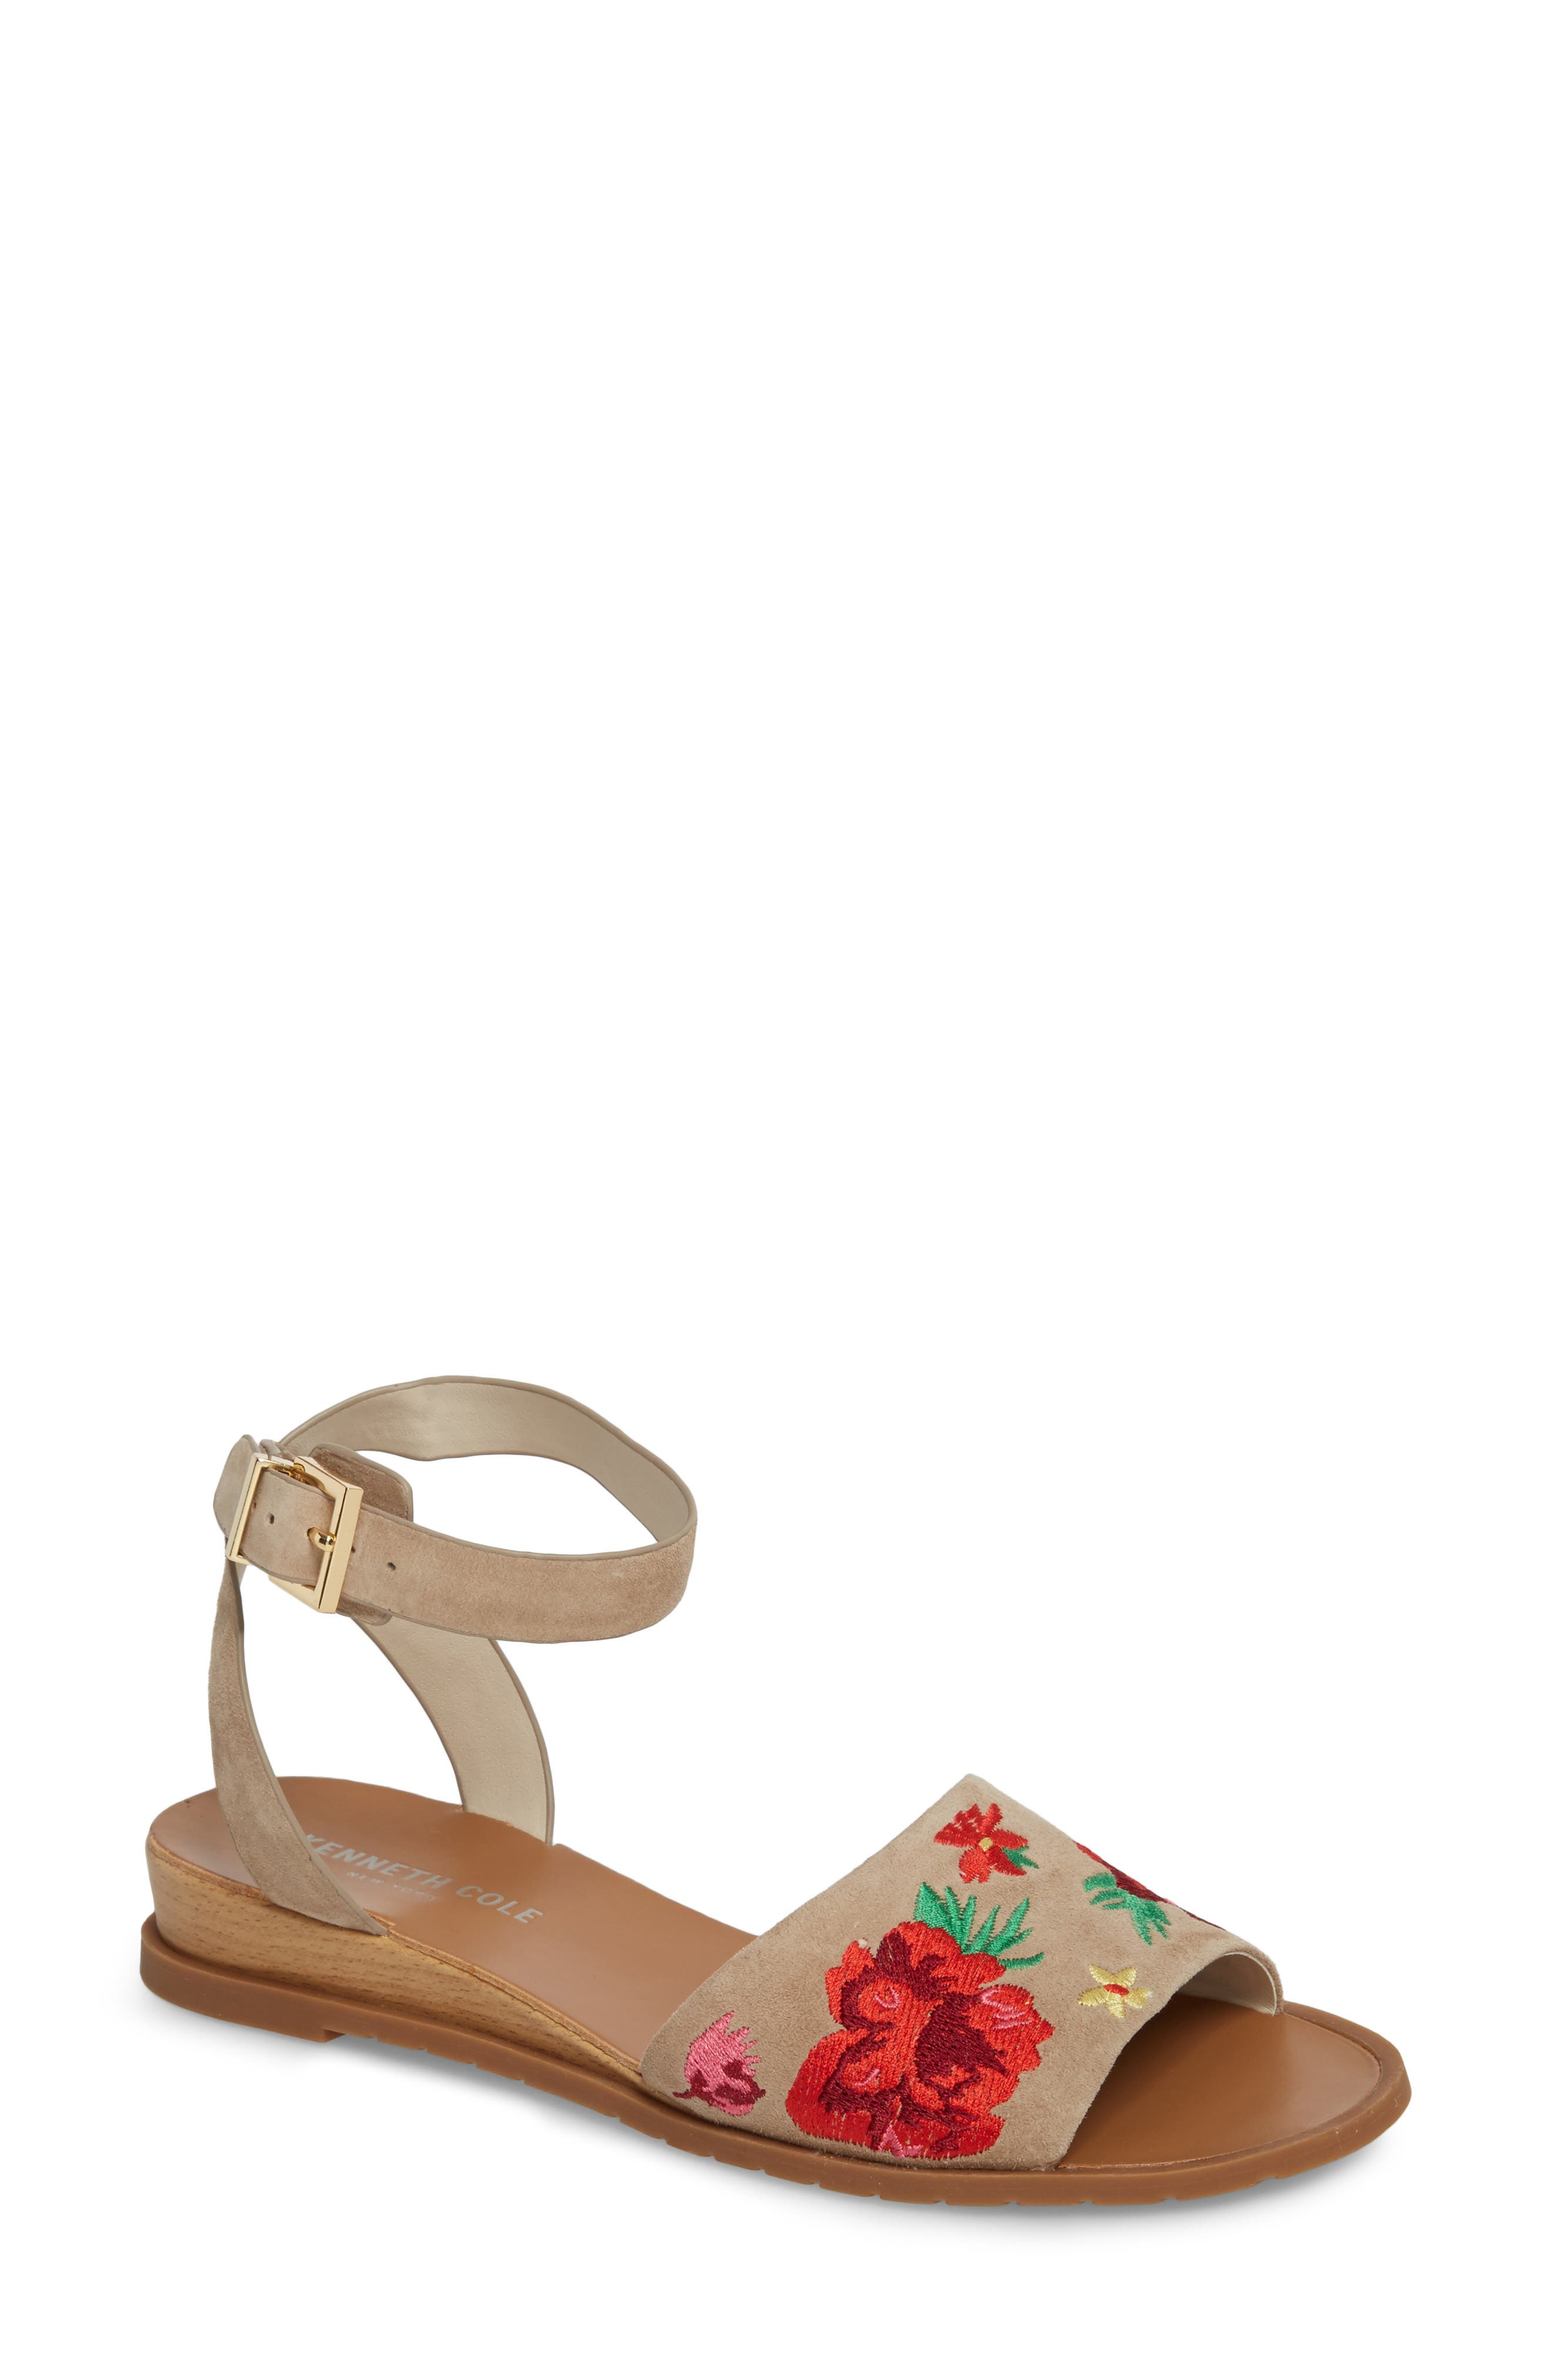 Jinny Ankle Strap Sandal,                             Main thumbnail 1, color,                             250